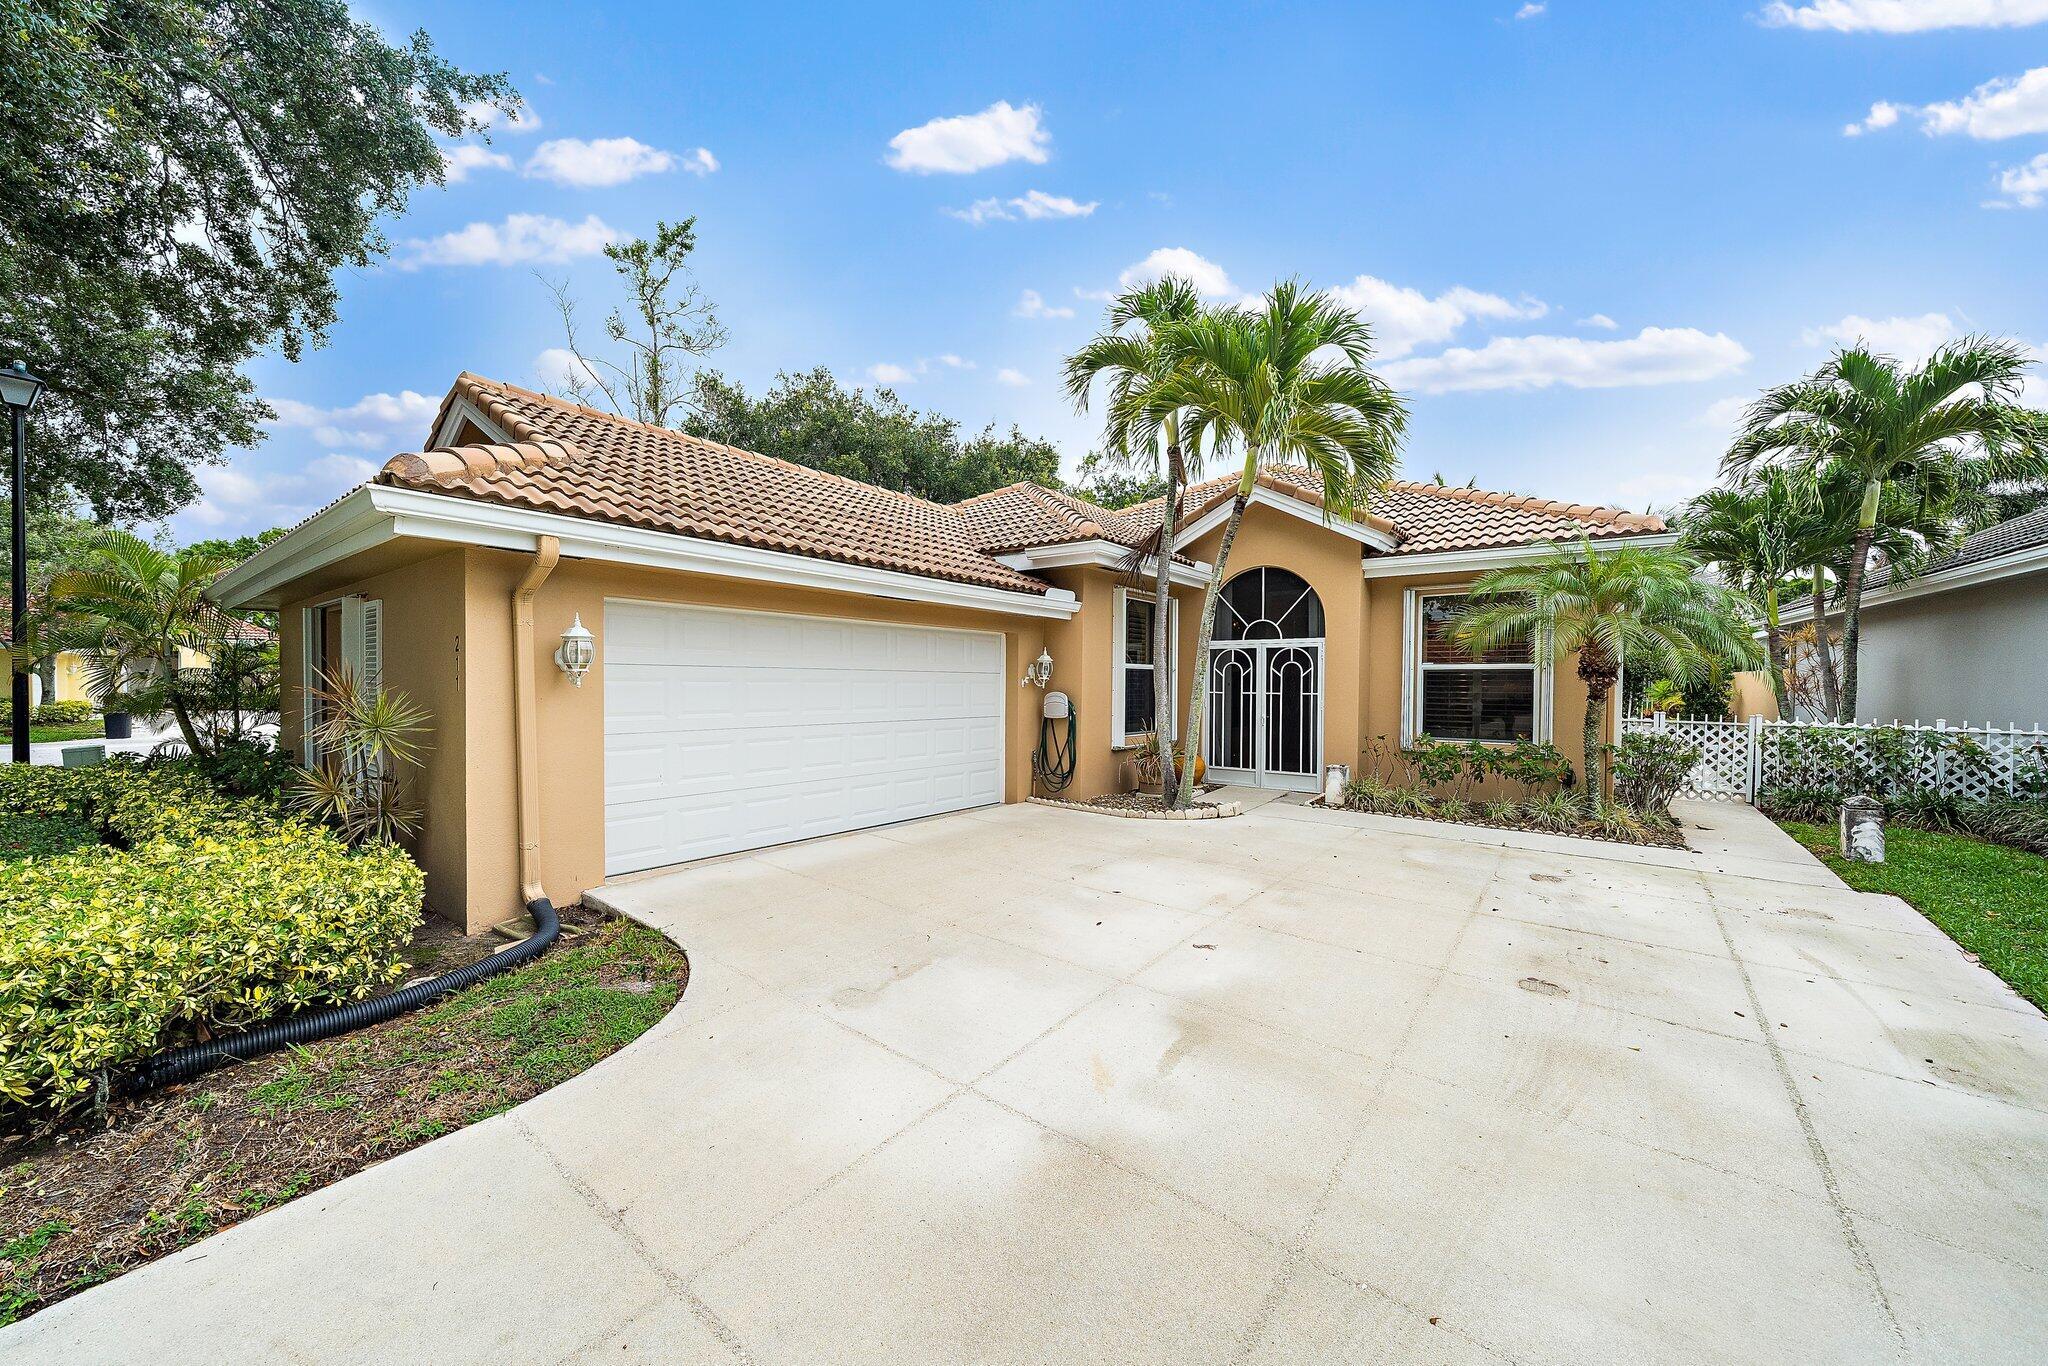 211 S Hampton Drive  For Sale 10725207, FL